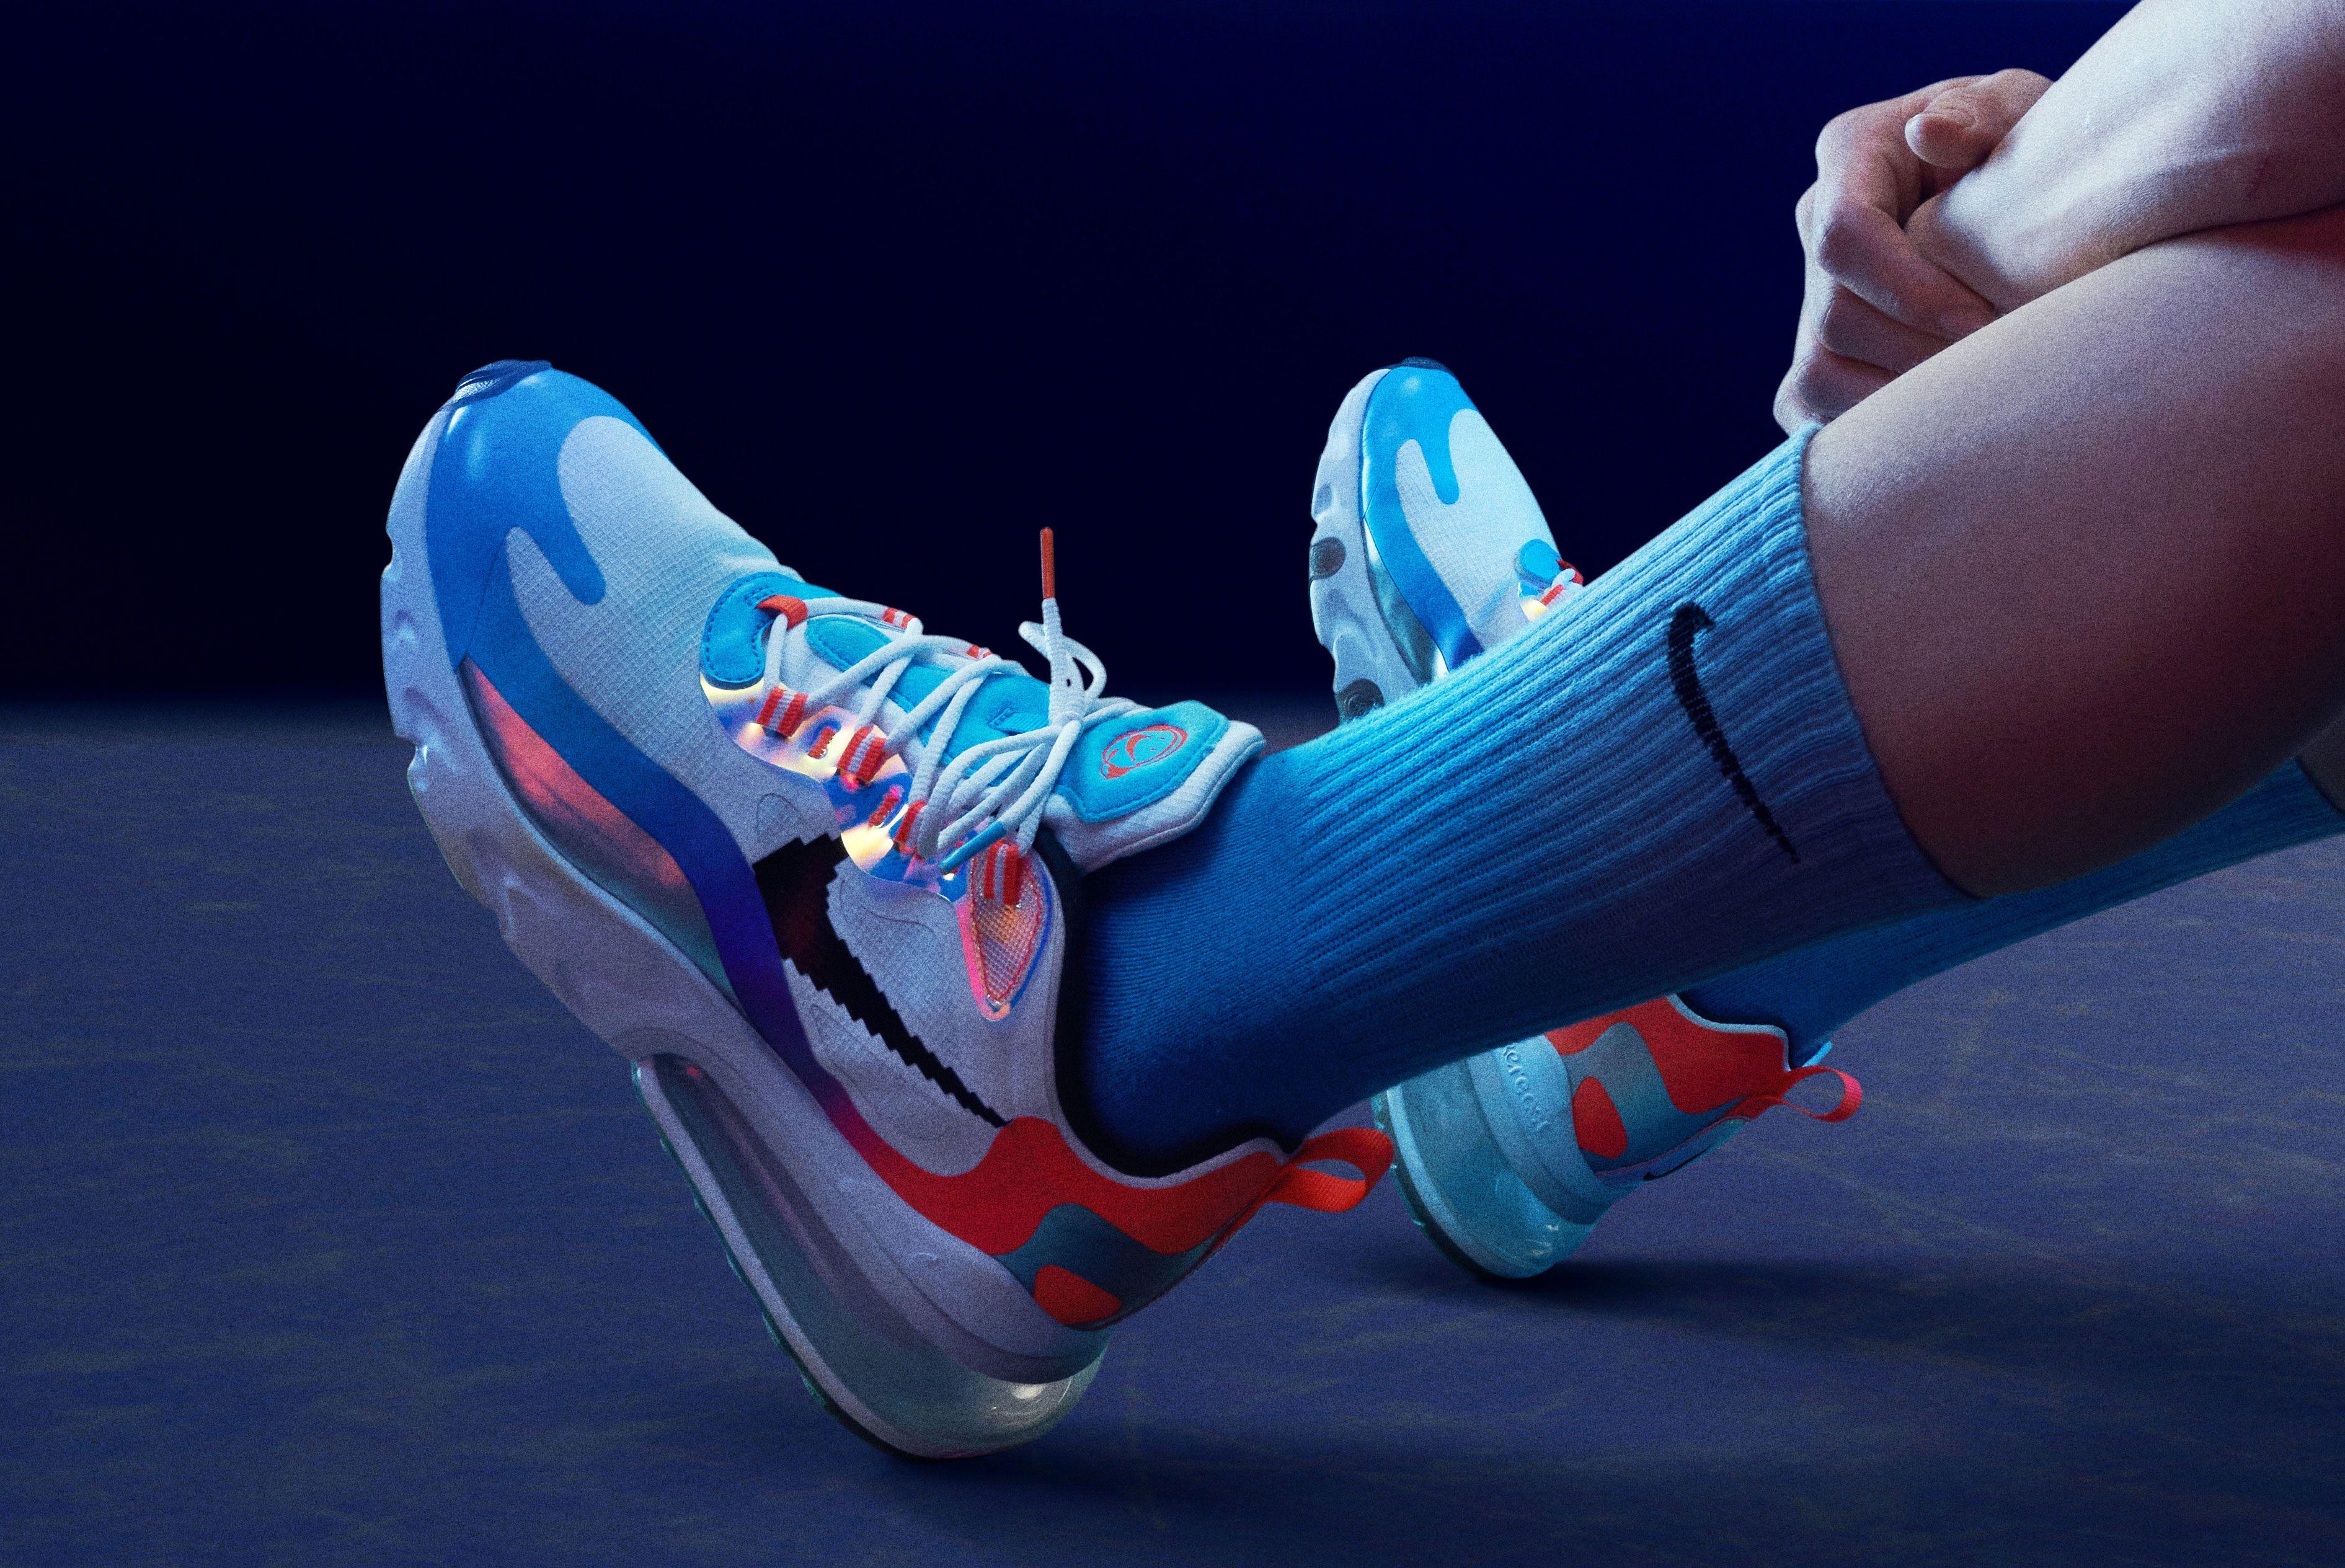 Nike Air Max 270 React 'Have a Good Game'